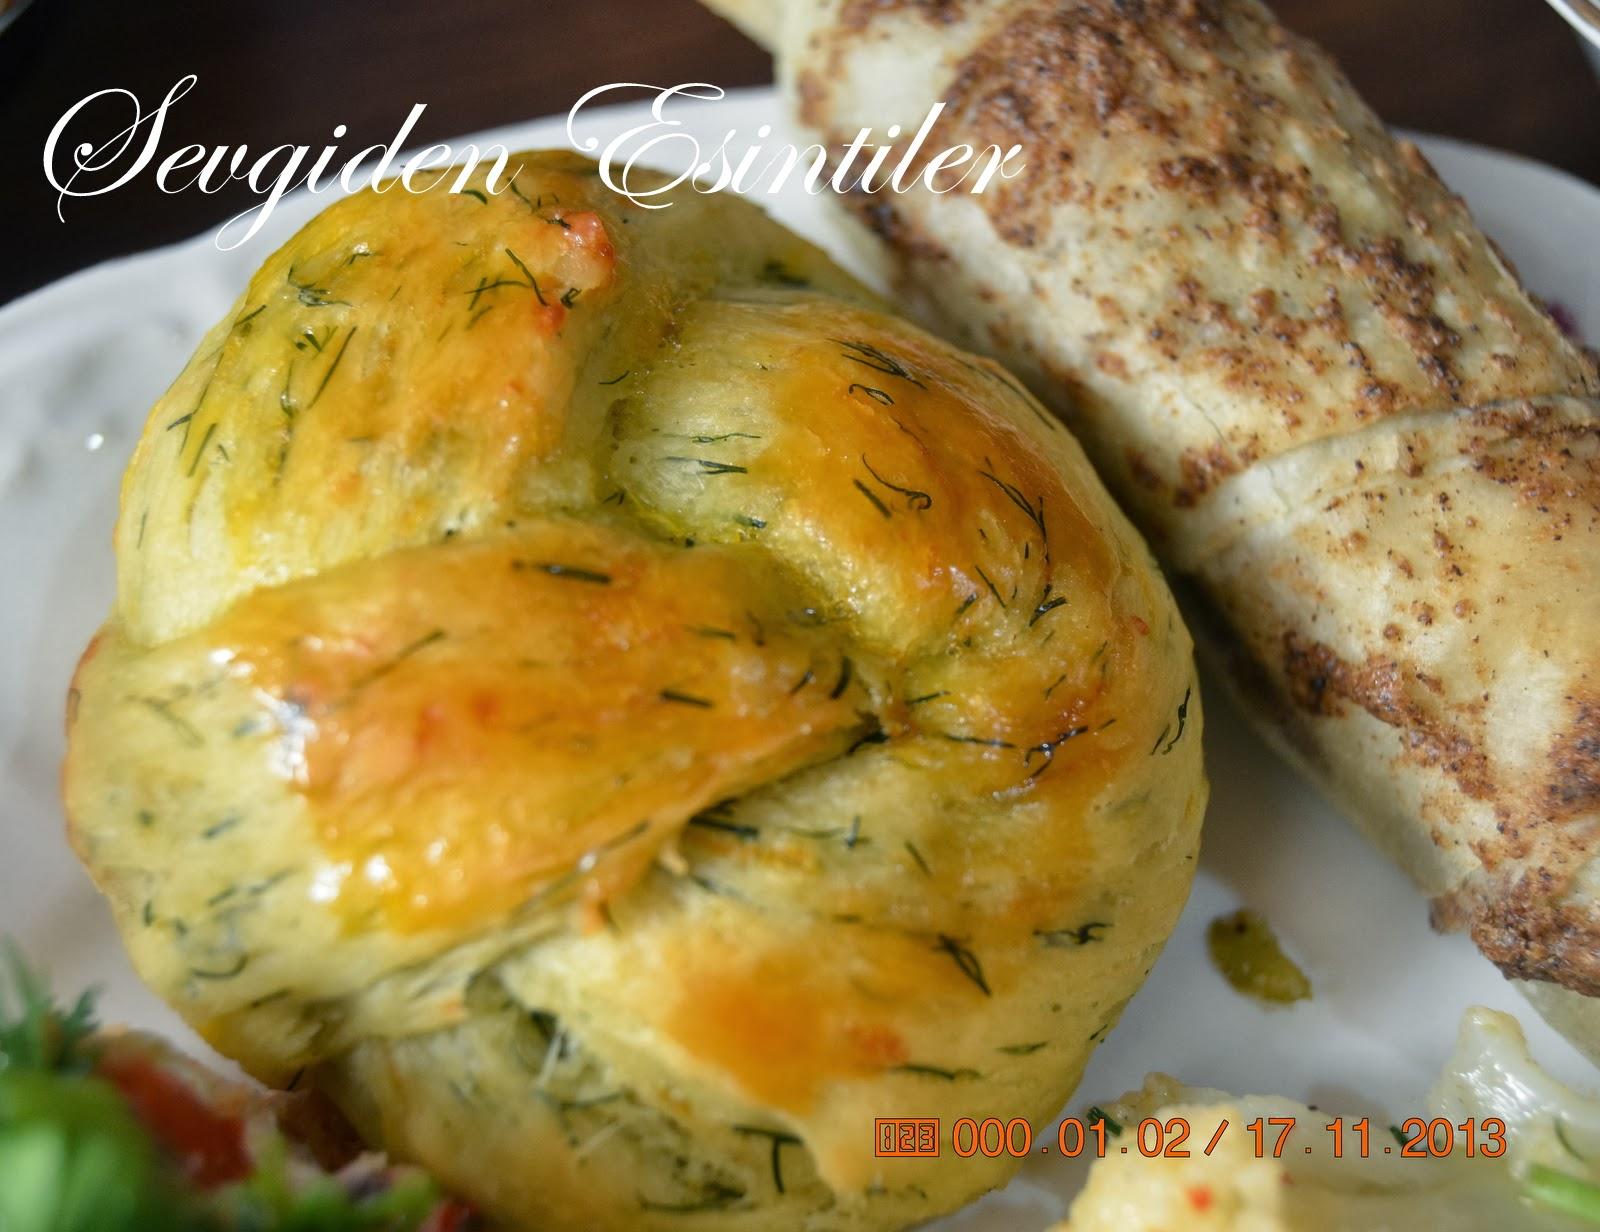 Dereotlu Peynirli Poğaça Videosu